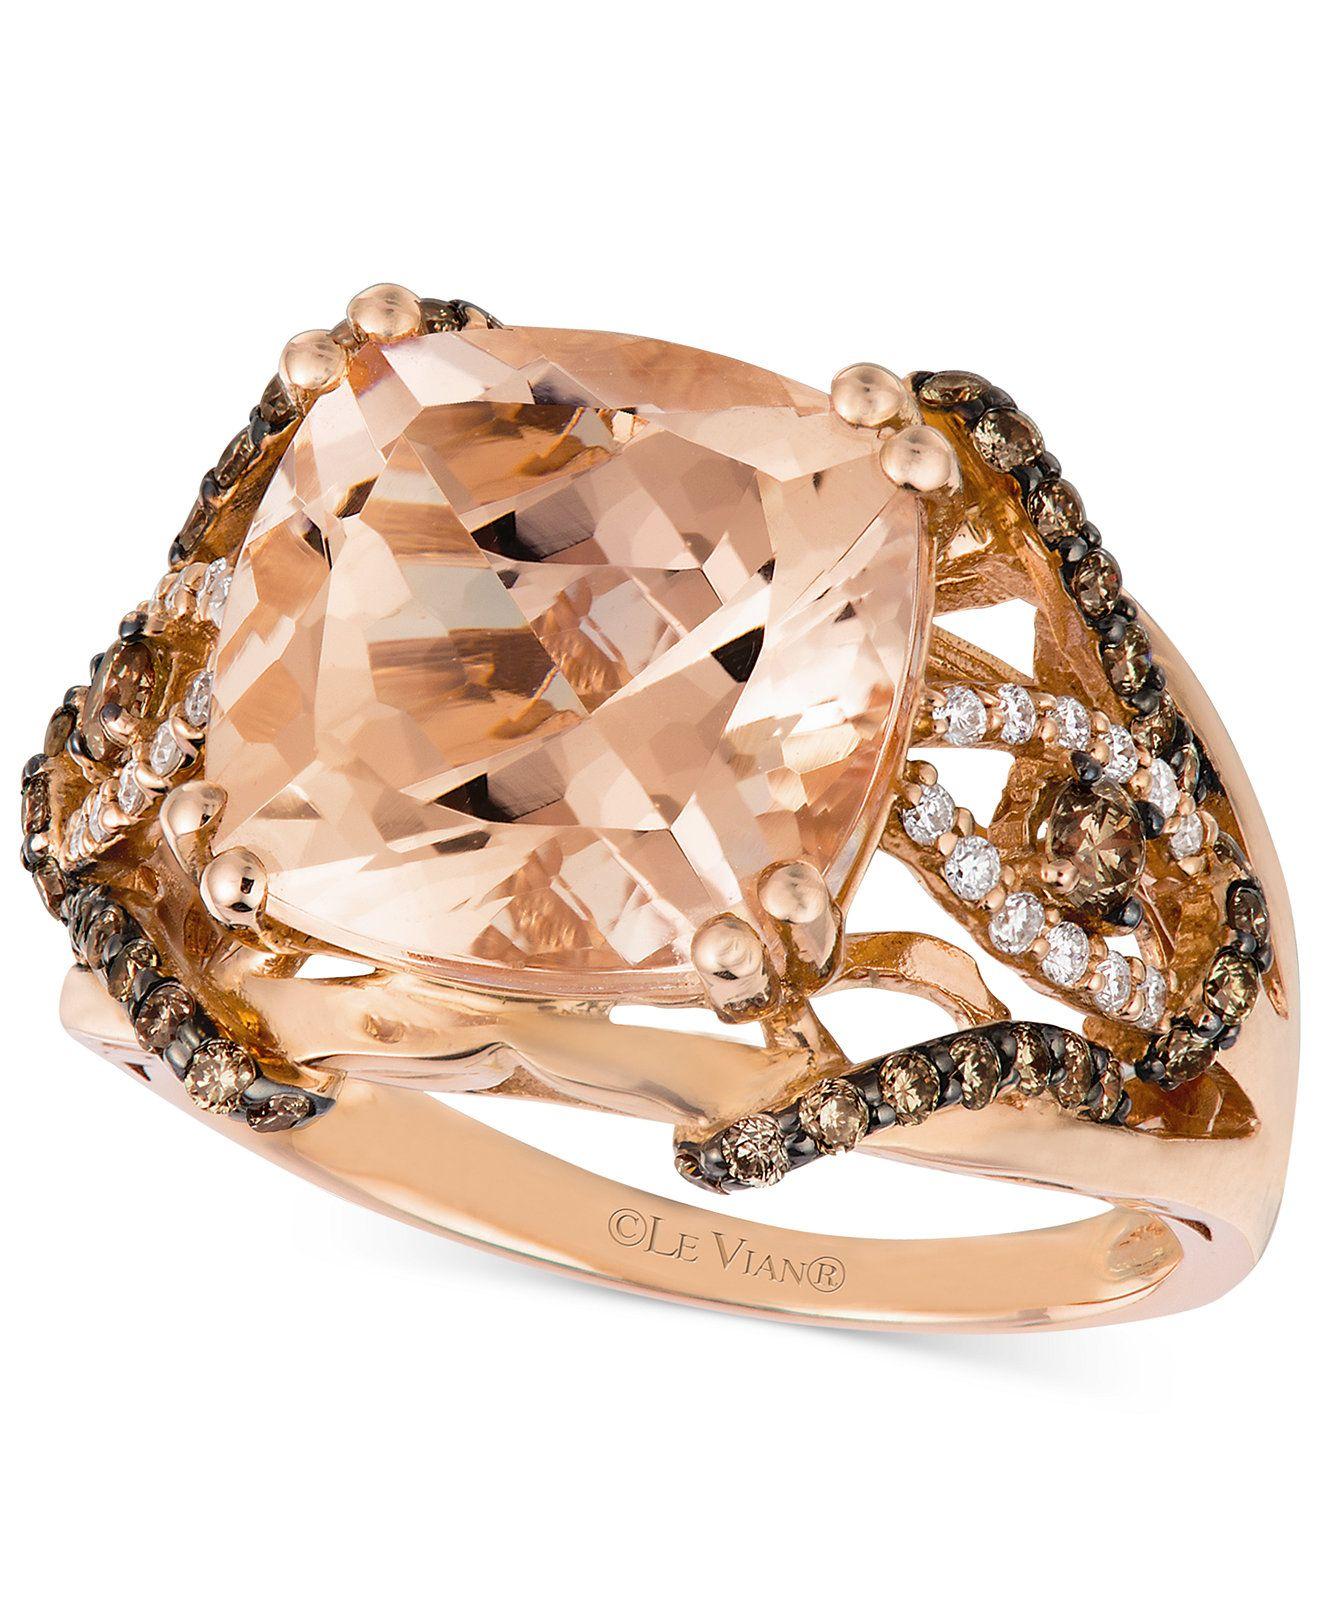 Le Vian 14k Rose Gold Bridal Set Chocolate Diamond 1 3 4 ct